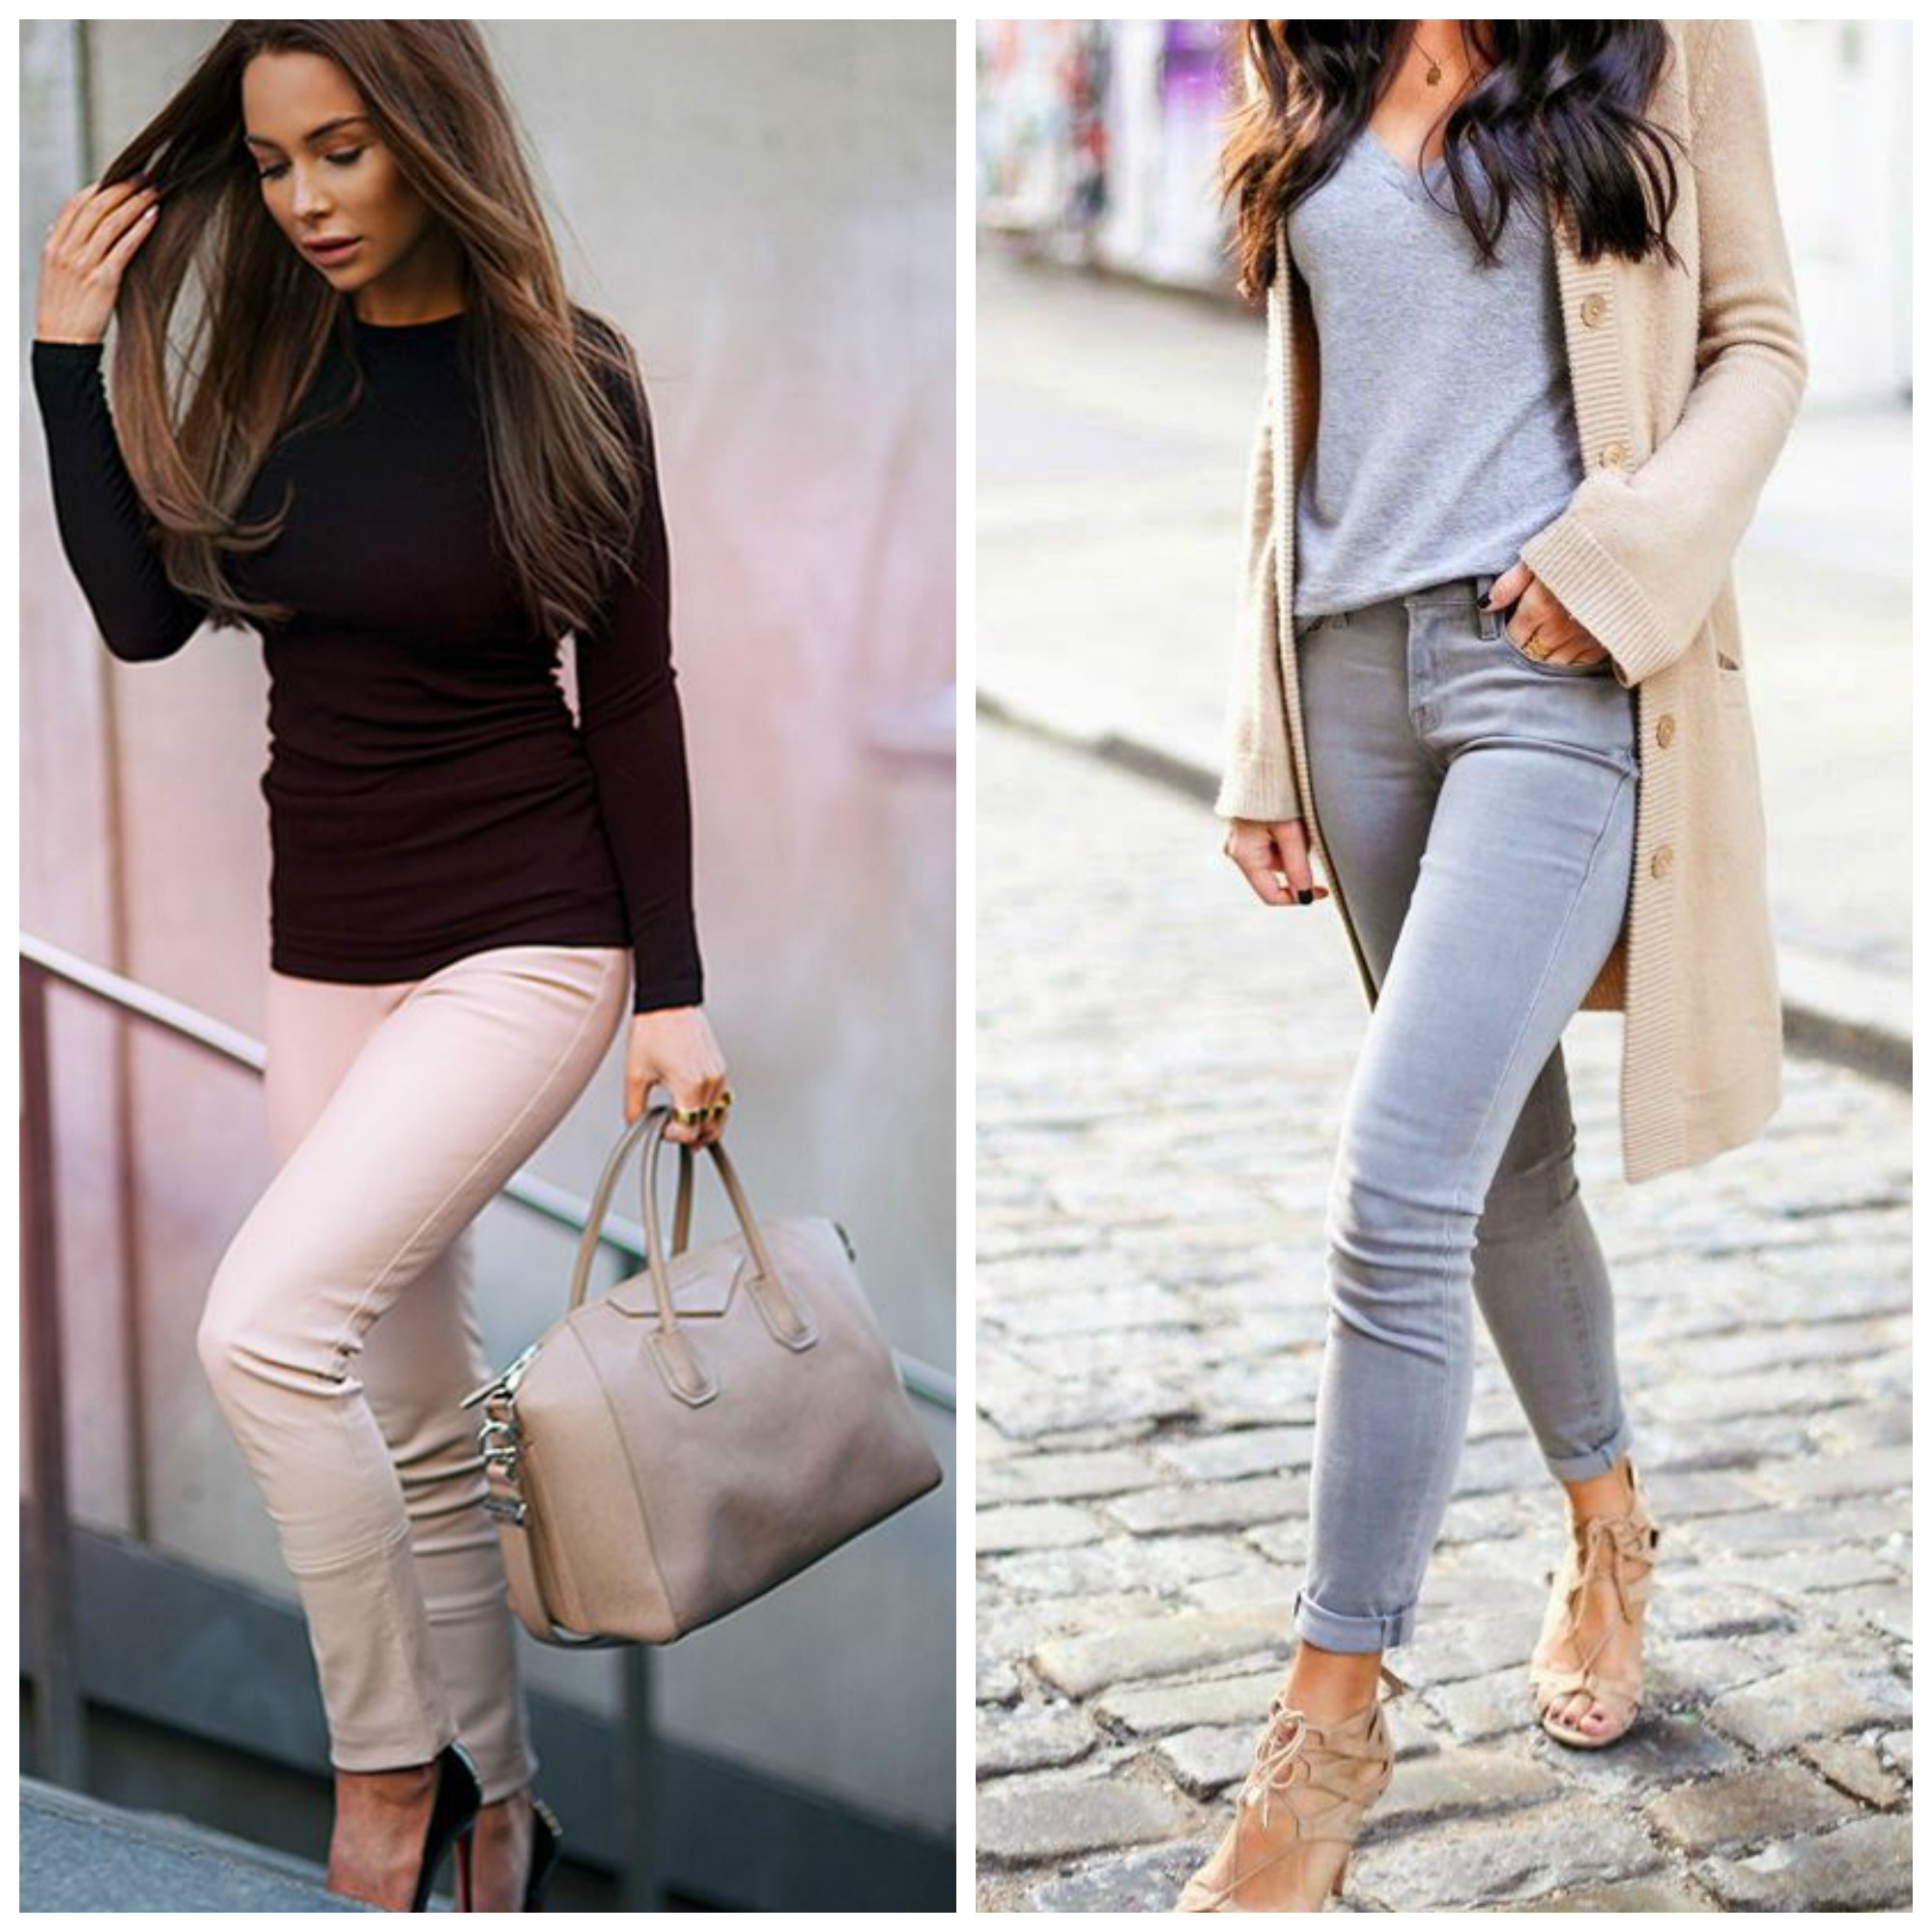 curating a neutral wardrobe